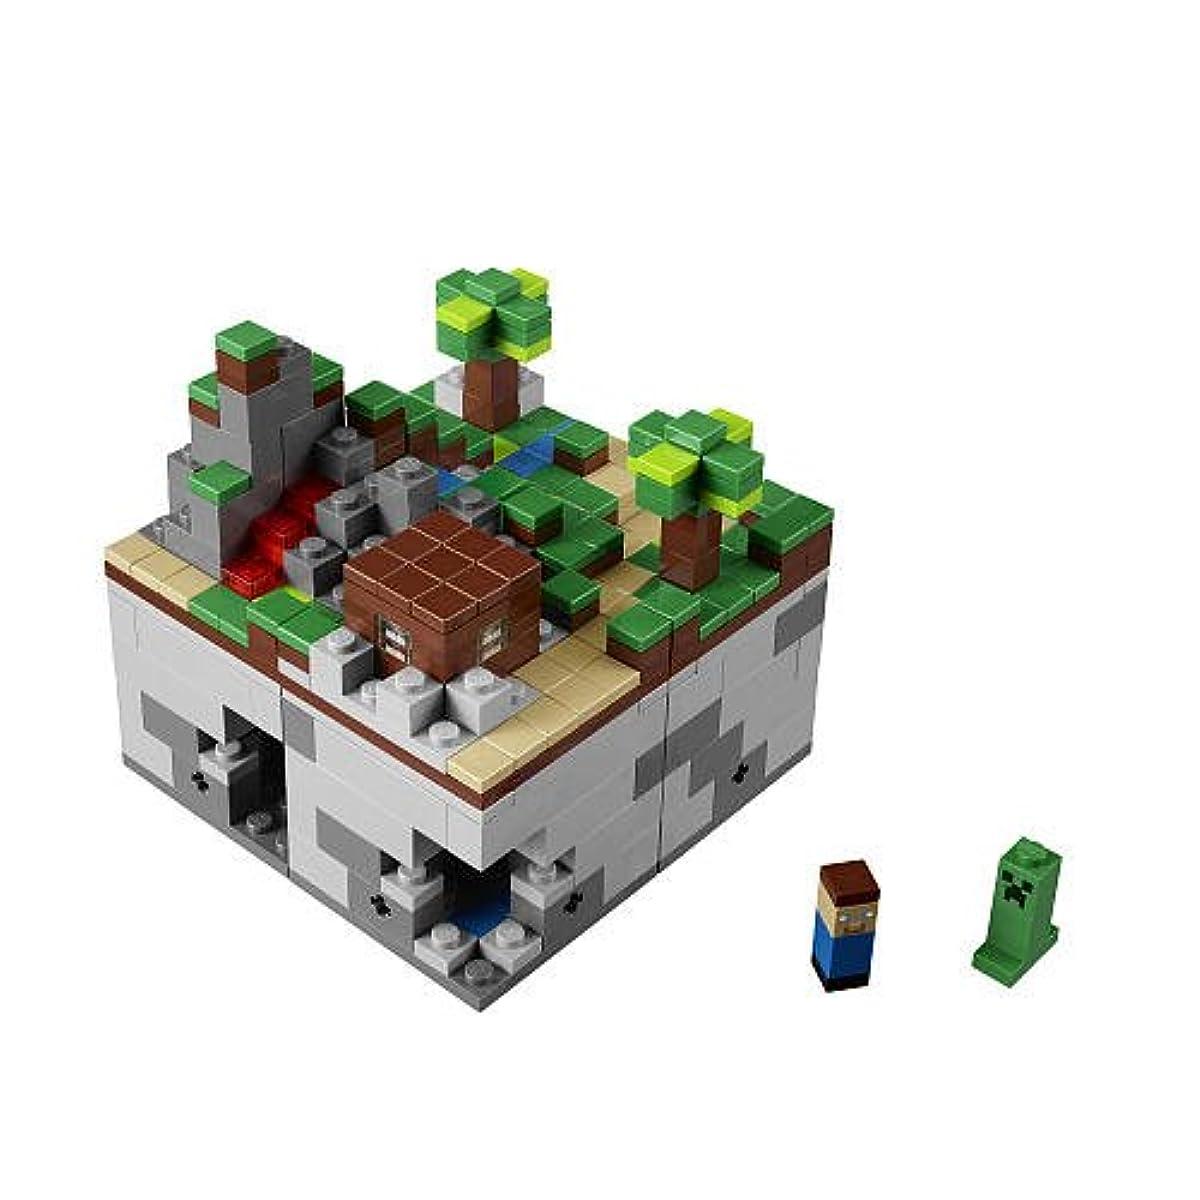 Lego Minecraft The End Portal 21124 6135571 Cuusoo Micro World Fi